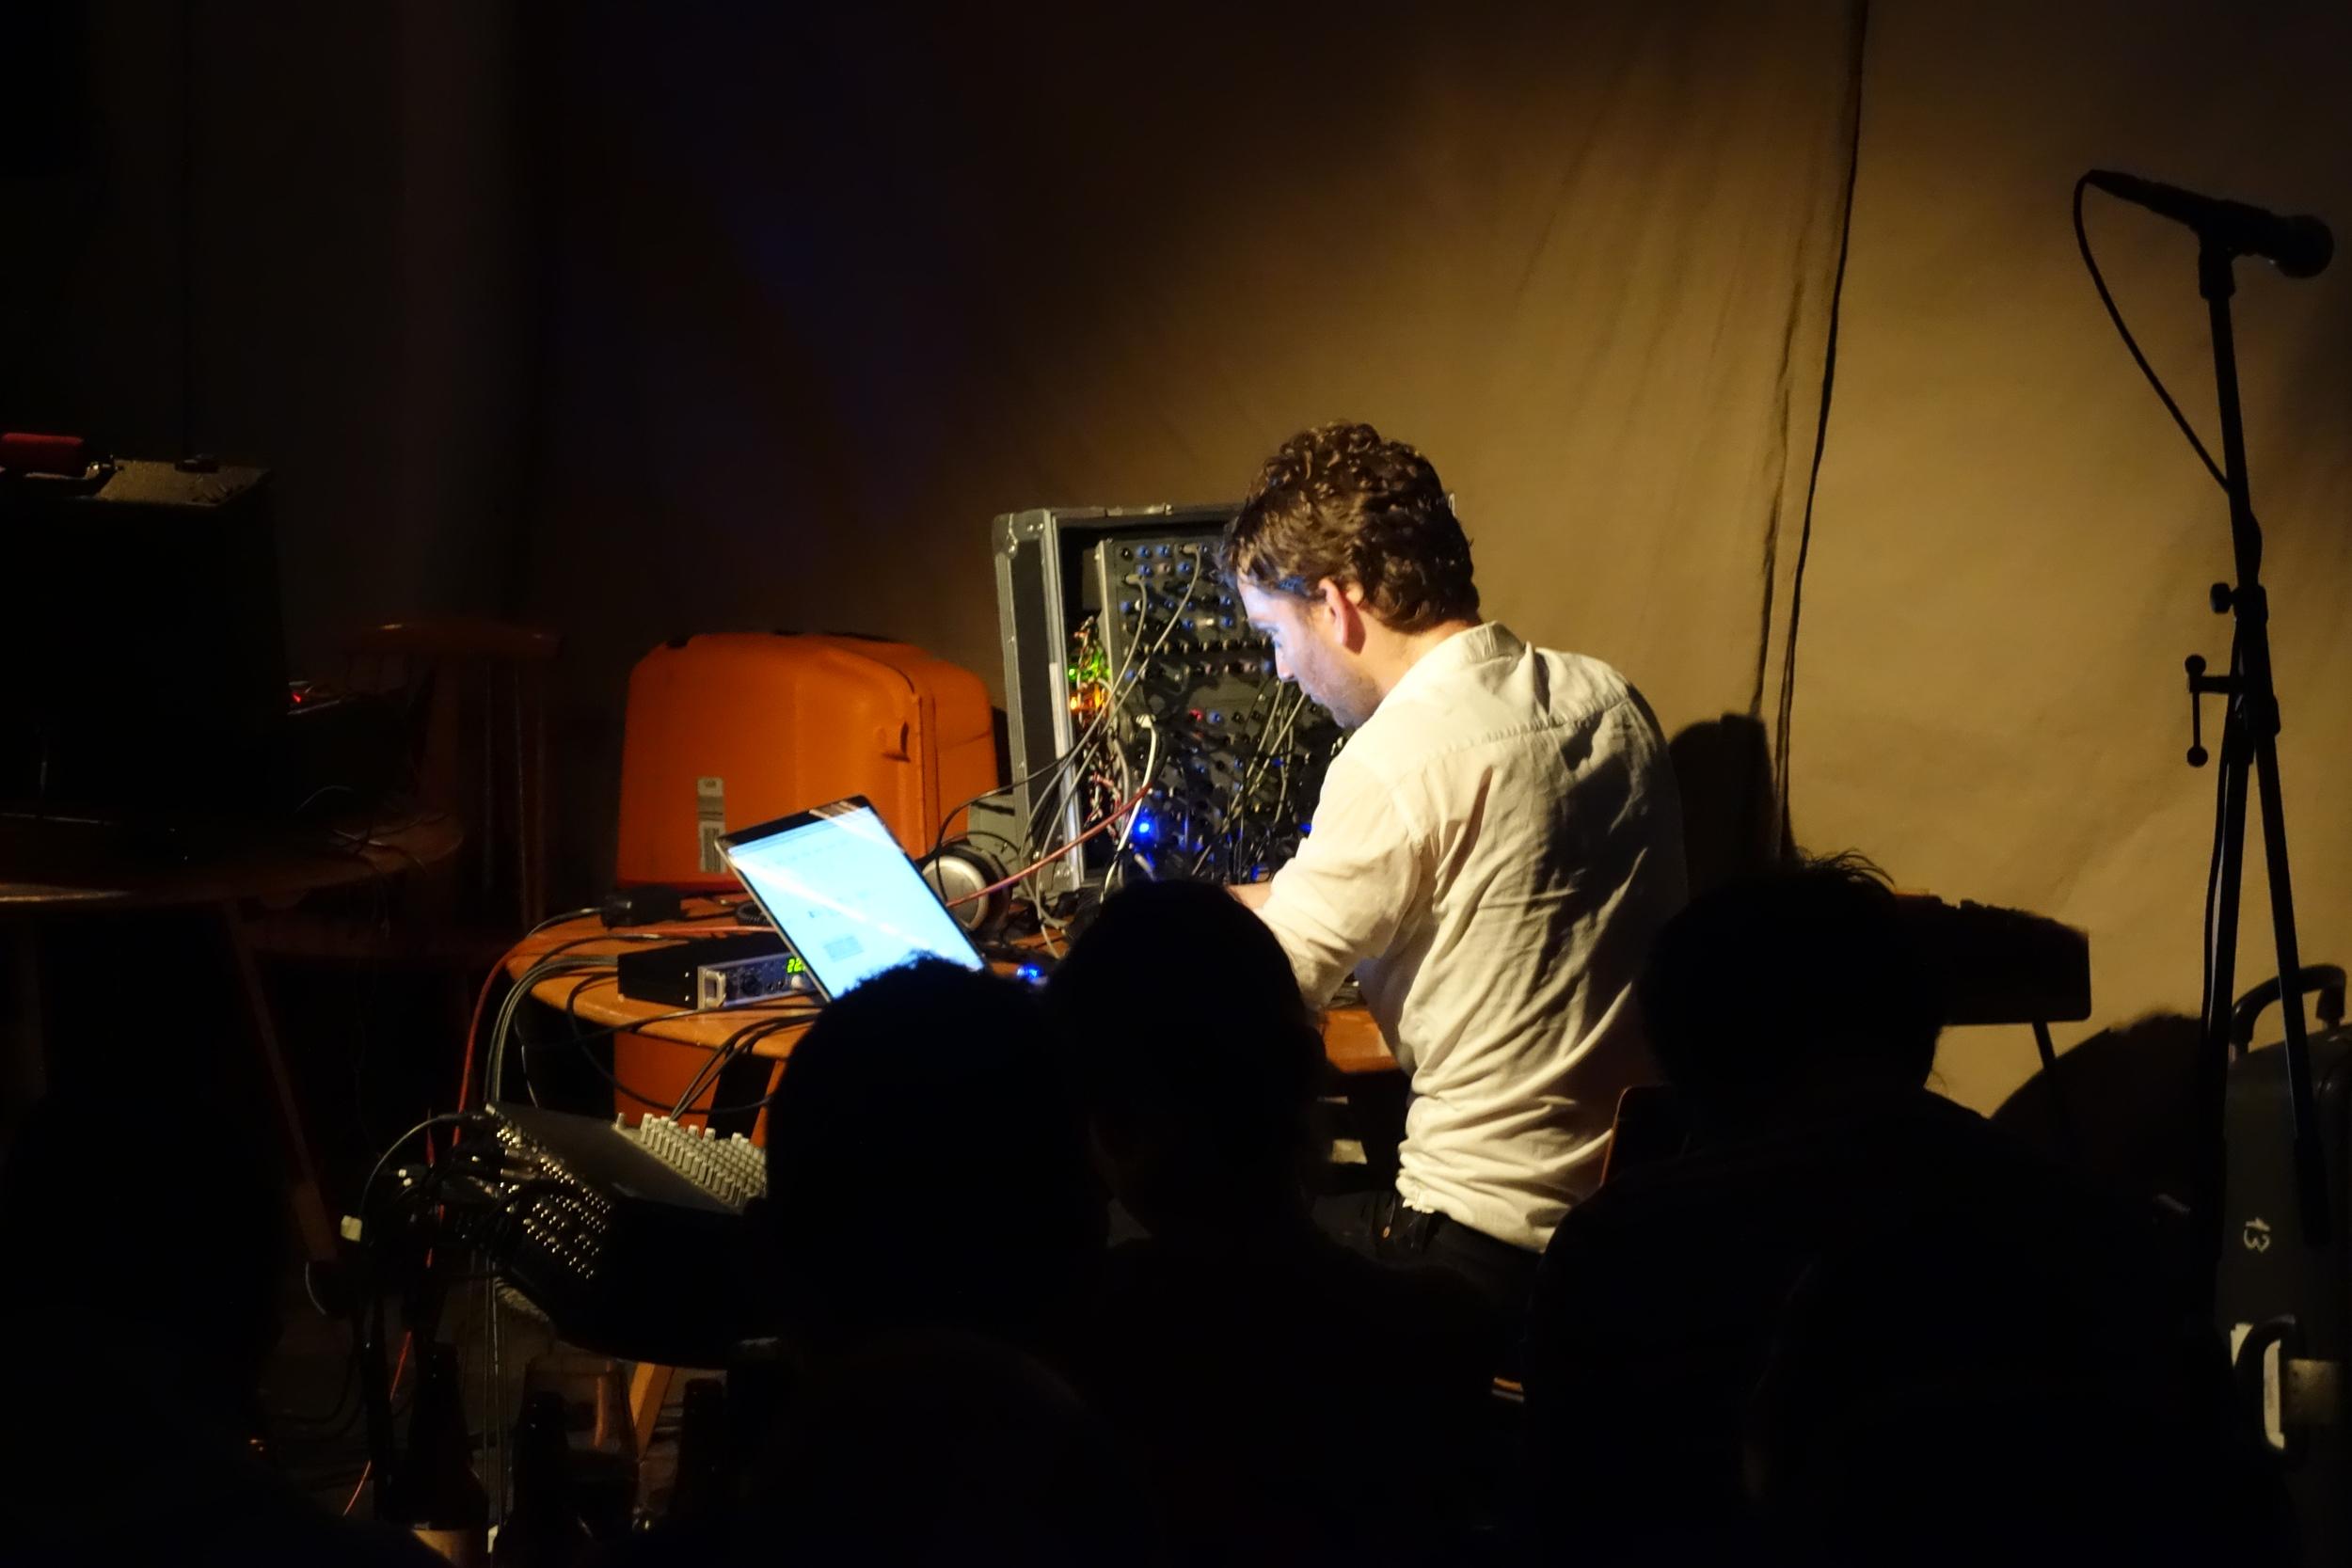 Thomas played a quad set on his Serge & a Max-MSP-based control setup - absolutely stellar.